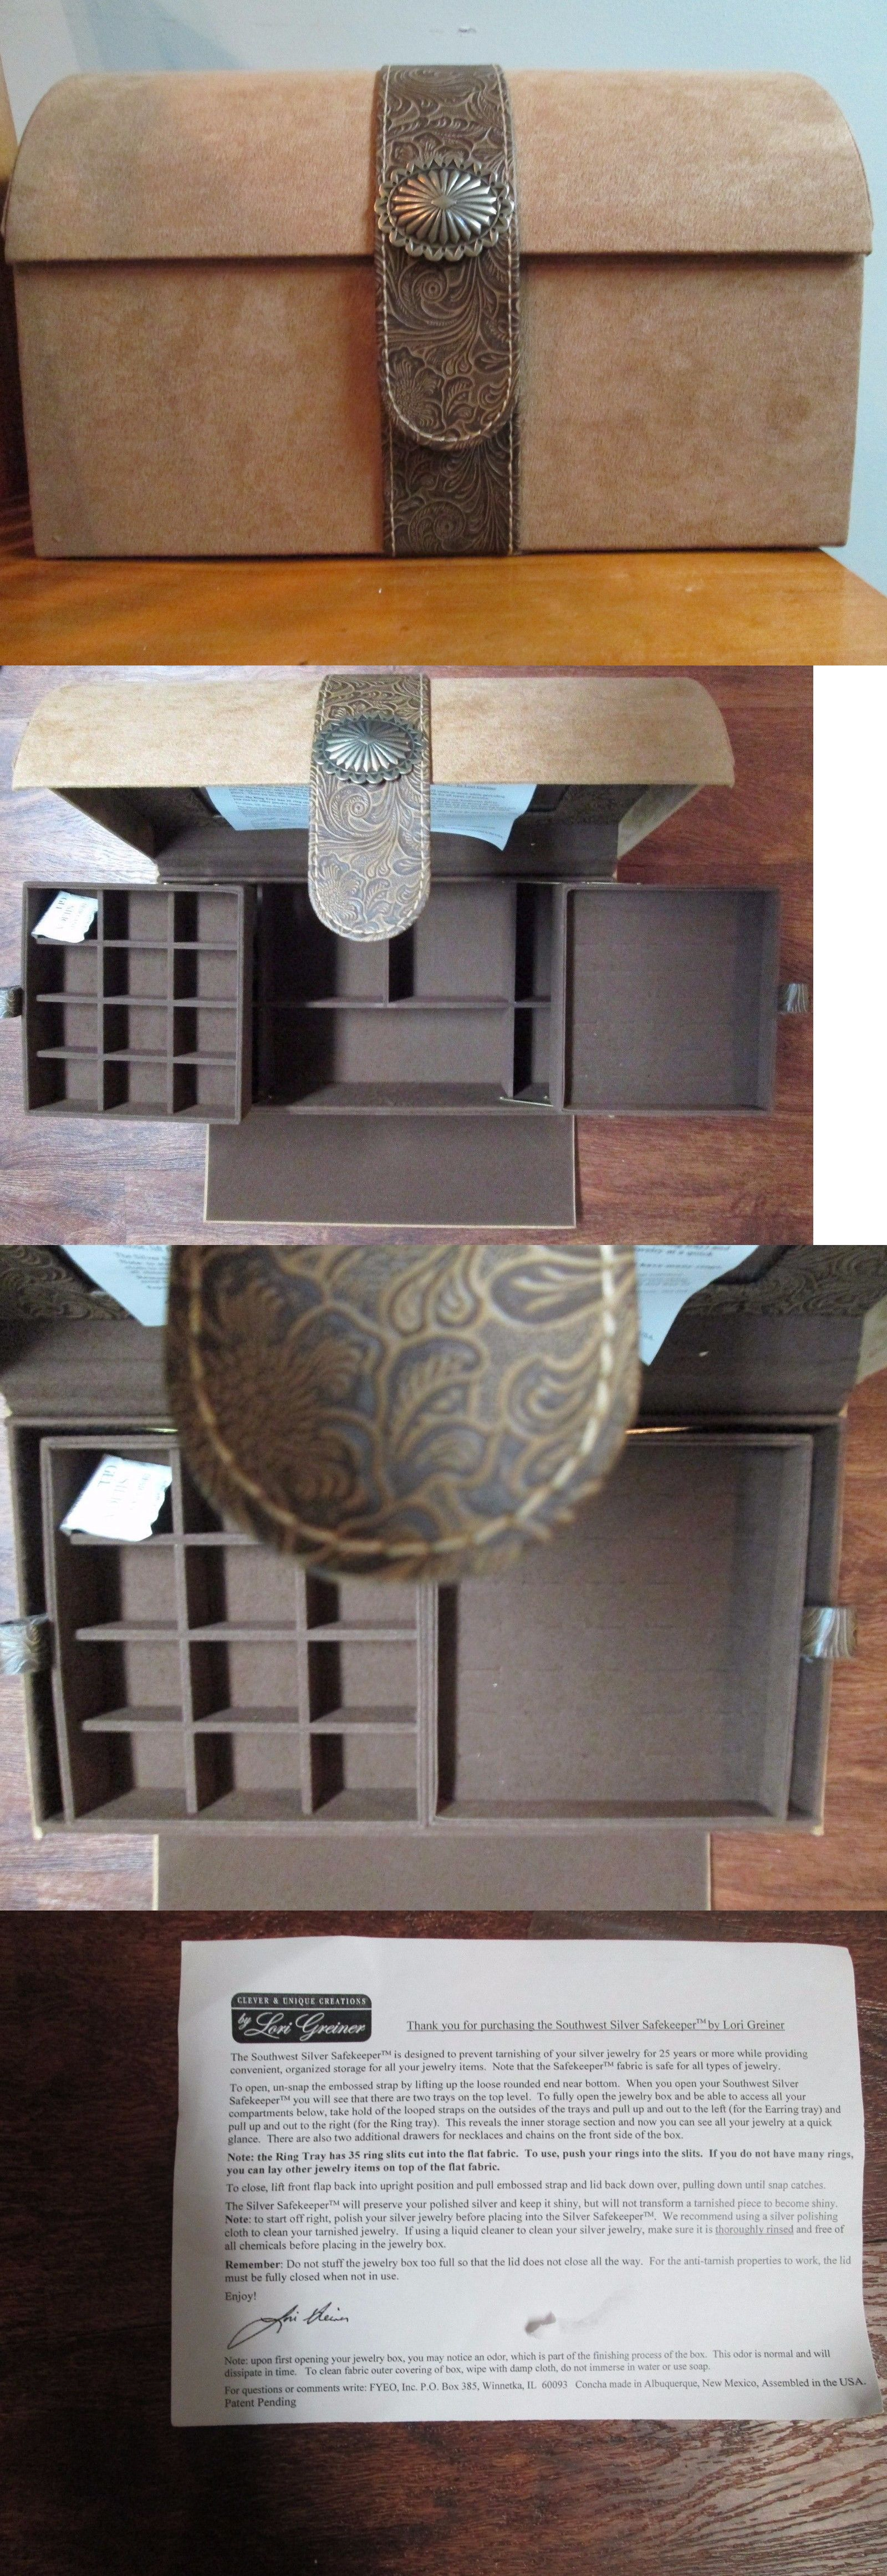 Jewelry Boxes 3820 Luxury Silver Safekeeper Southwestern Jewelry